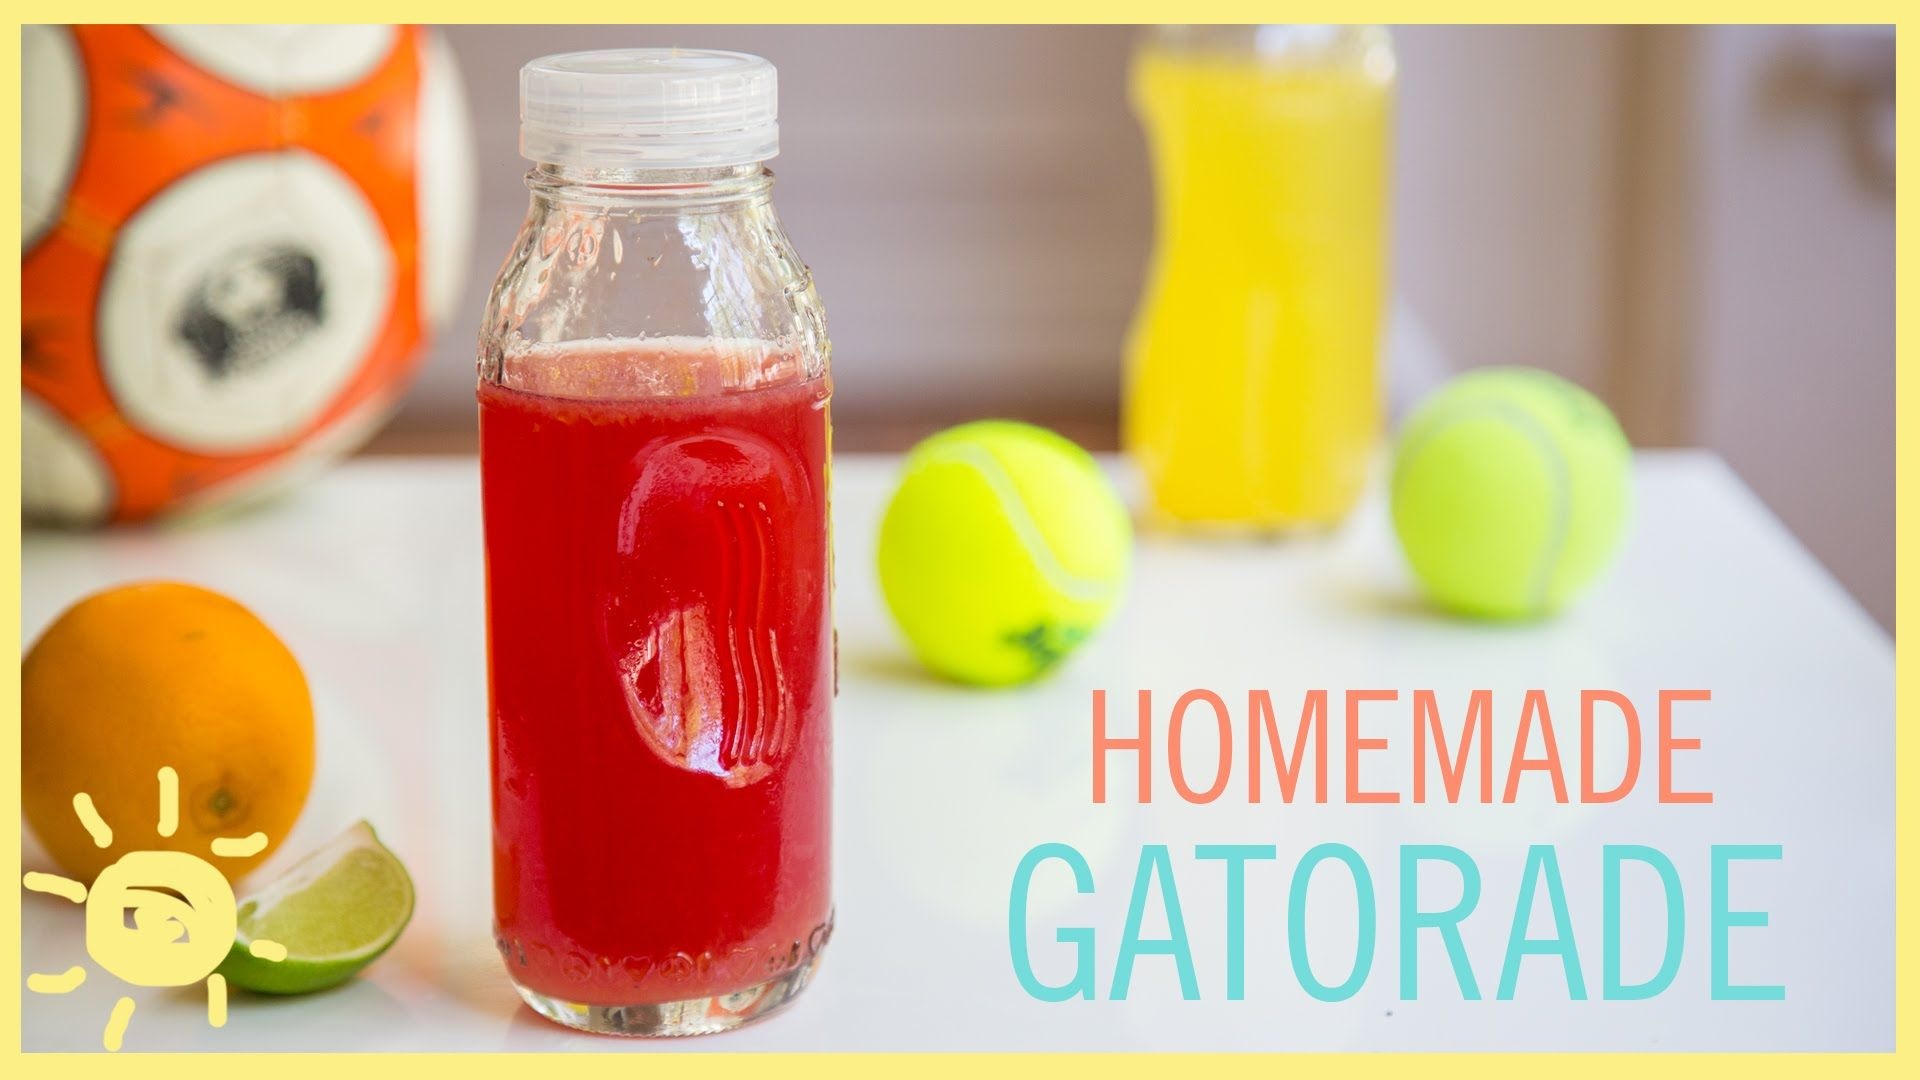 EAT Homemade gatorade, Healthy drinks for kids, Sports food